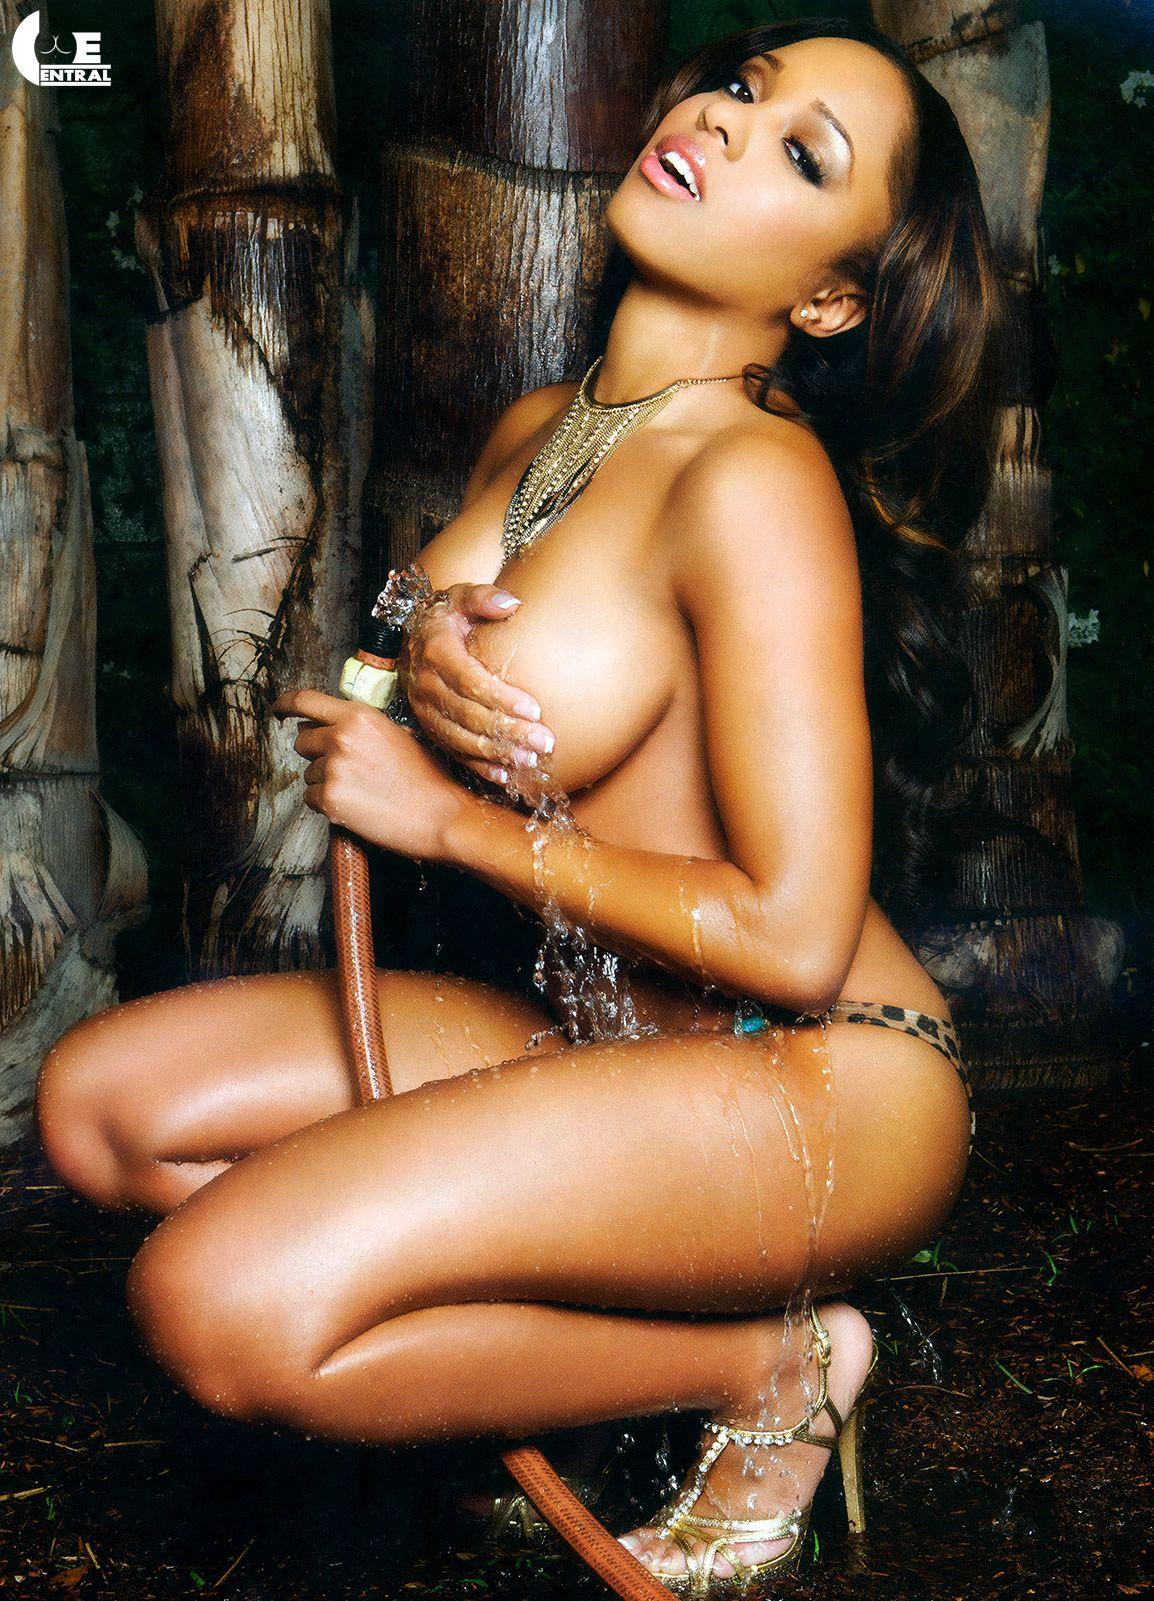 Jennifer nicole freeman nude gallery